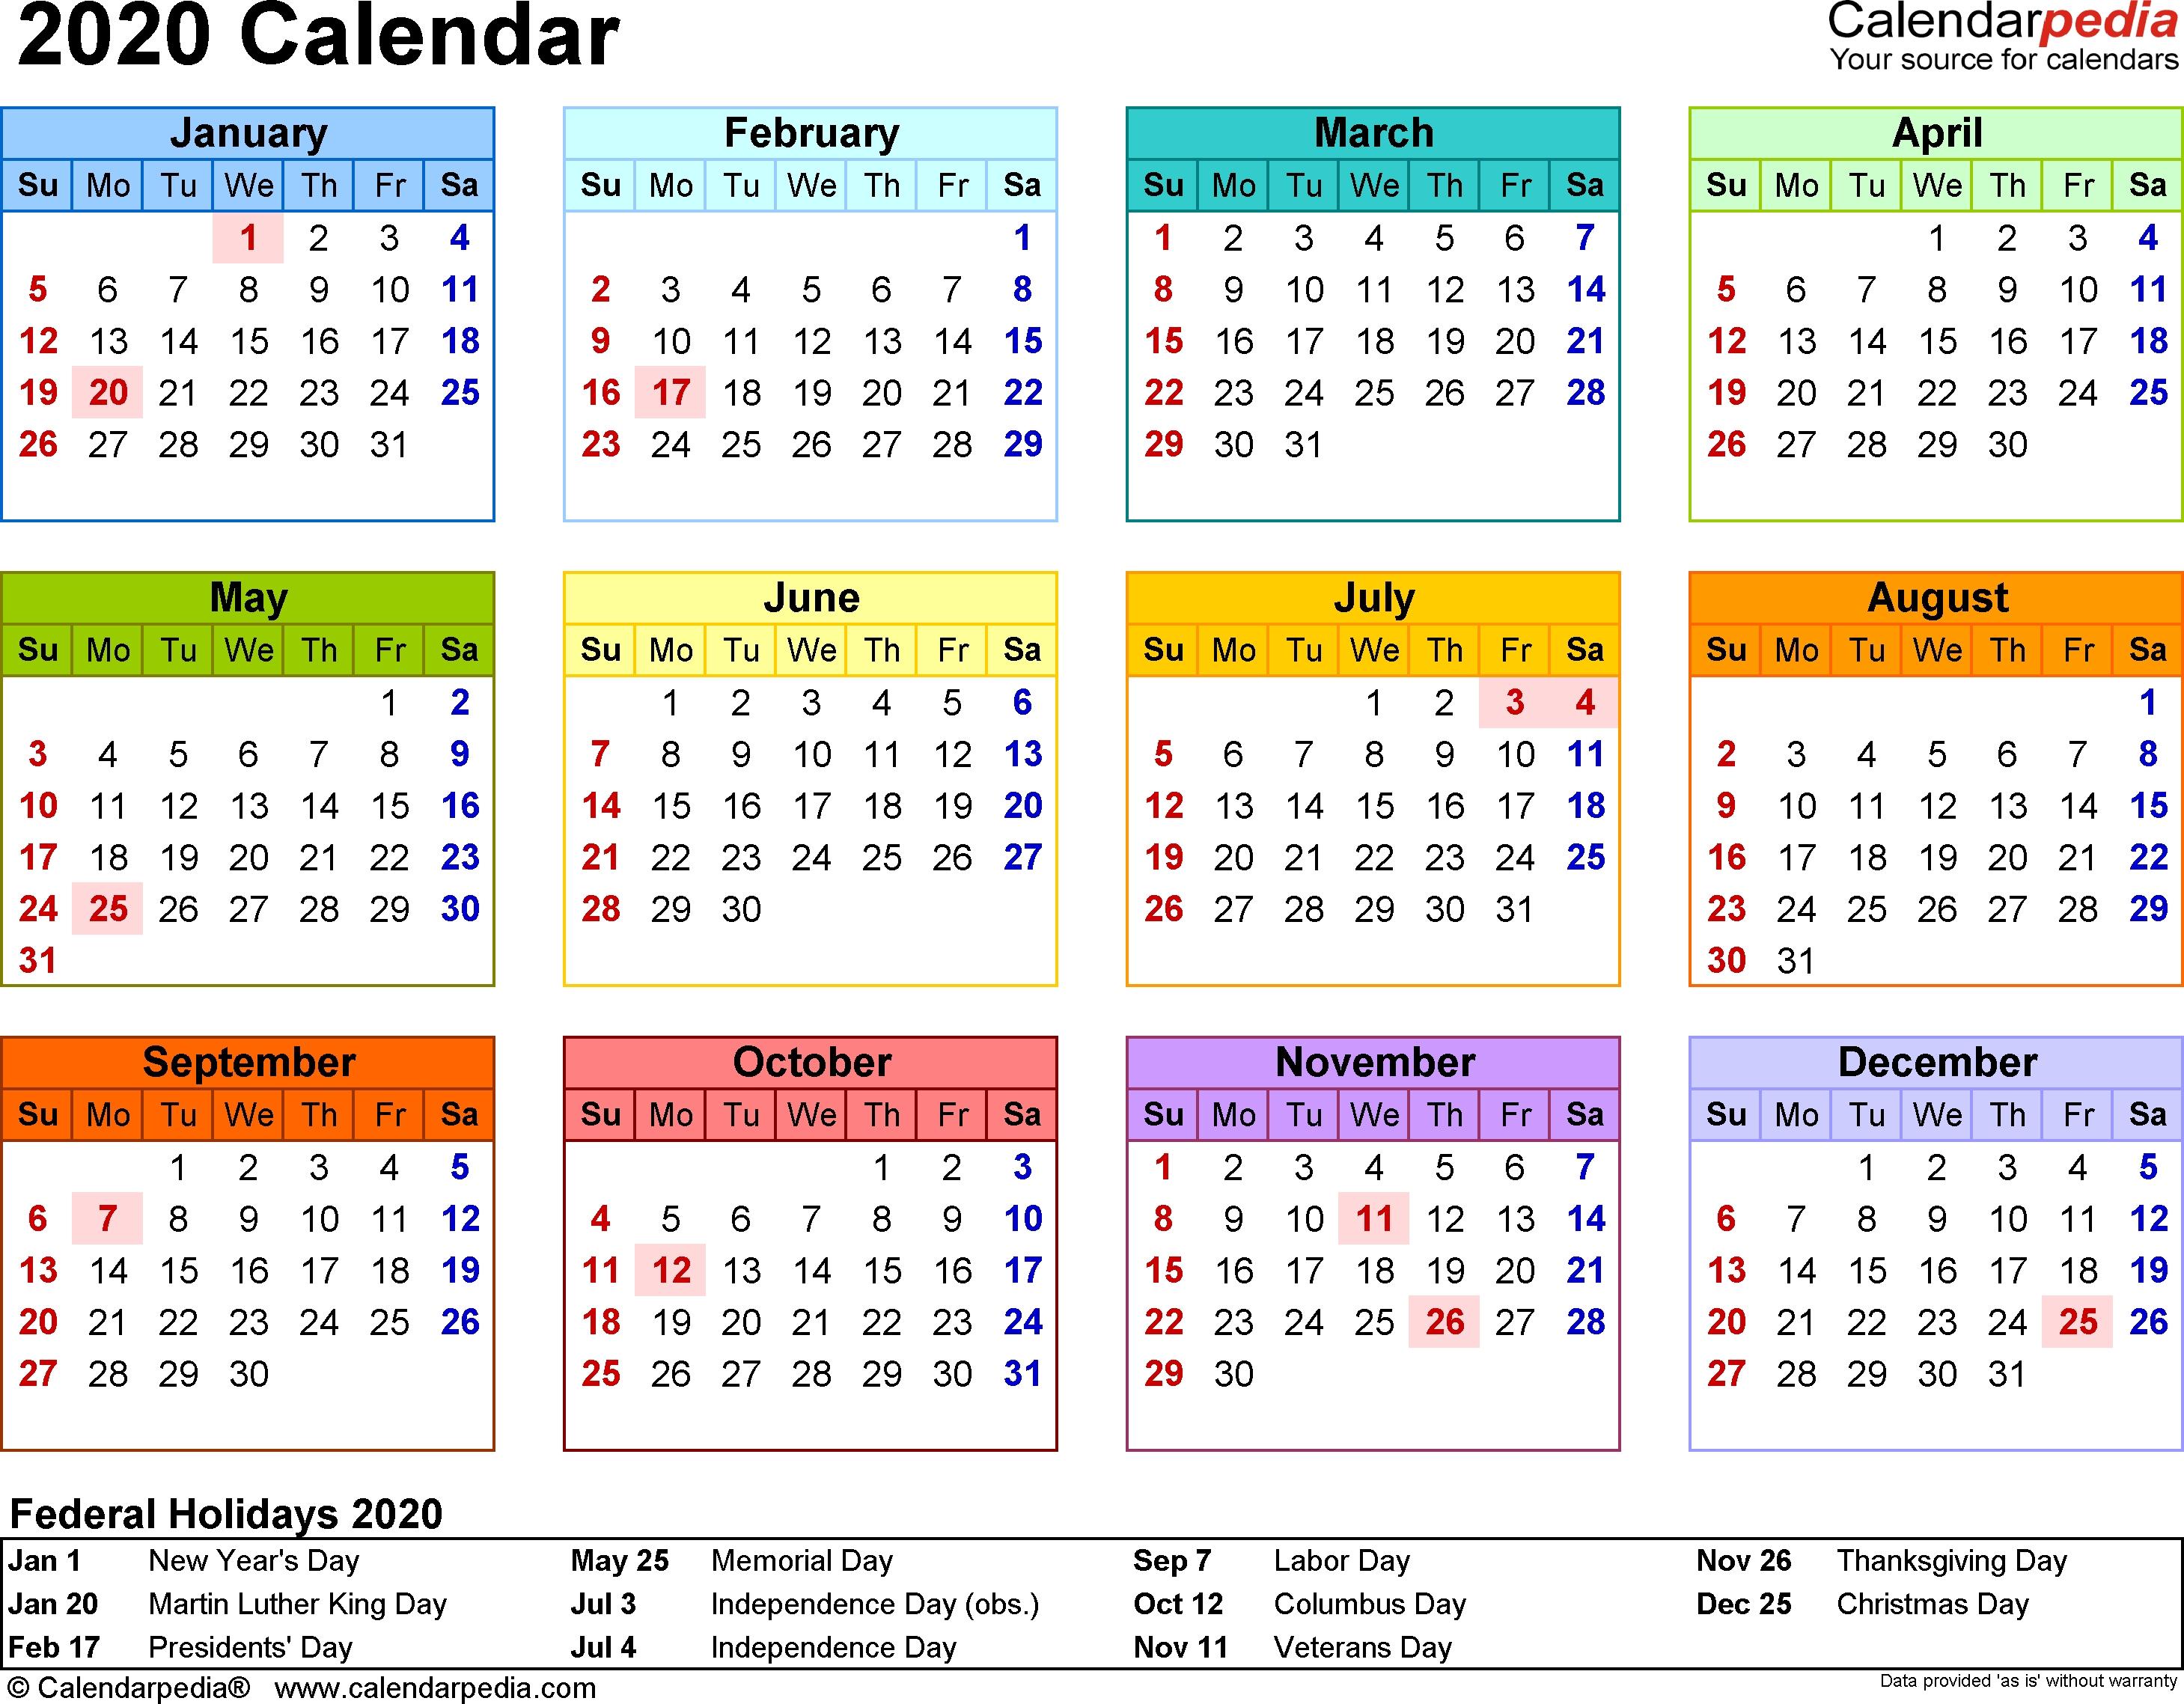 2020 Calendar - 17 Free Printable Word Calendar Templates 2020 Calendar Template Word